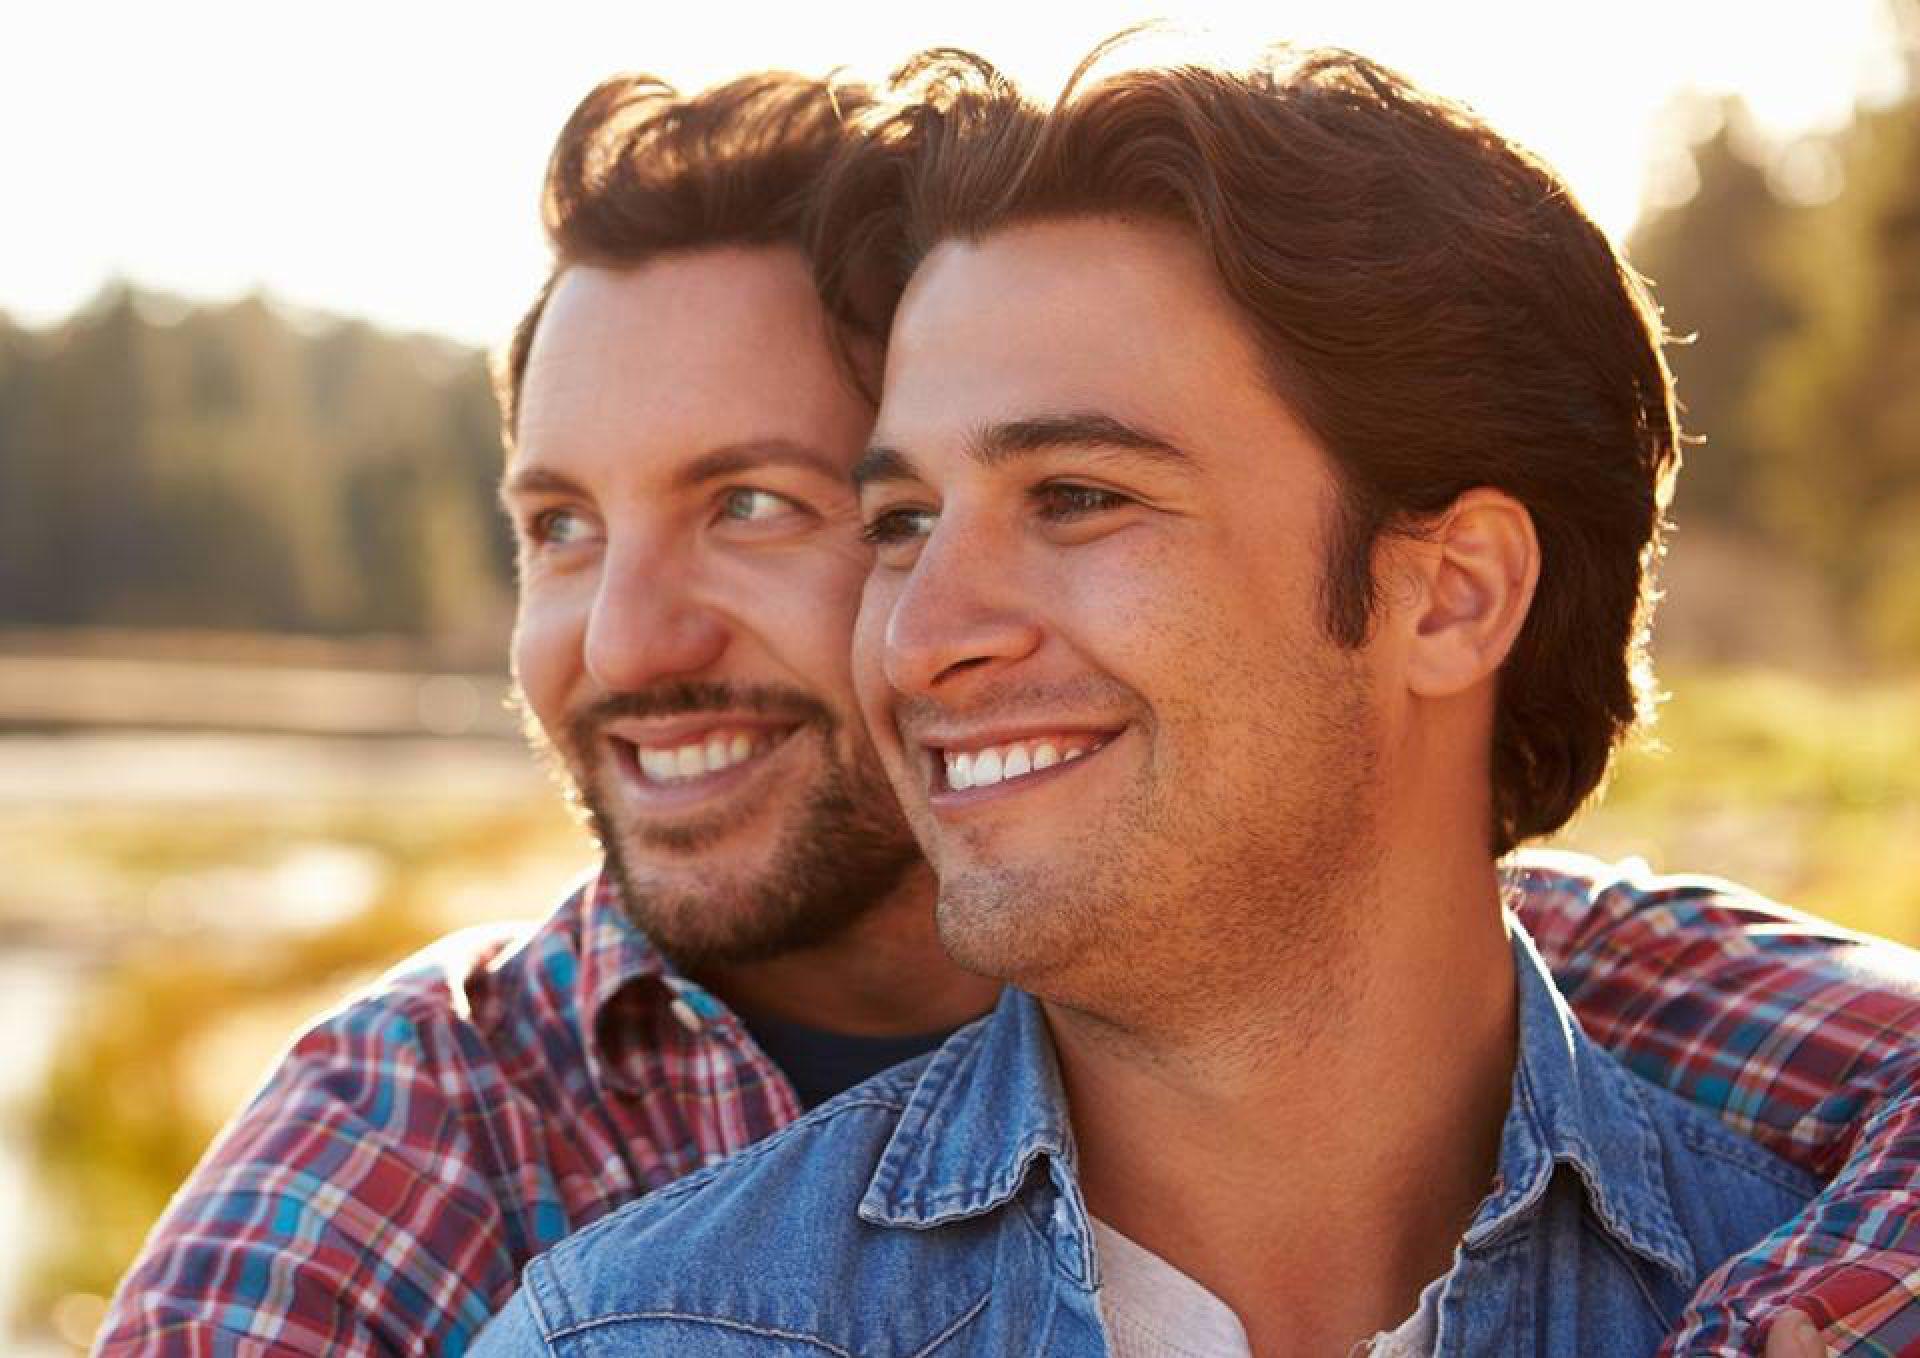 Gay Singles Looking for Gentlemen Date and Hookup Online in Independence